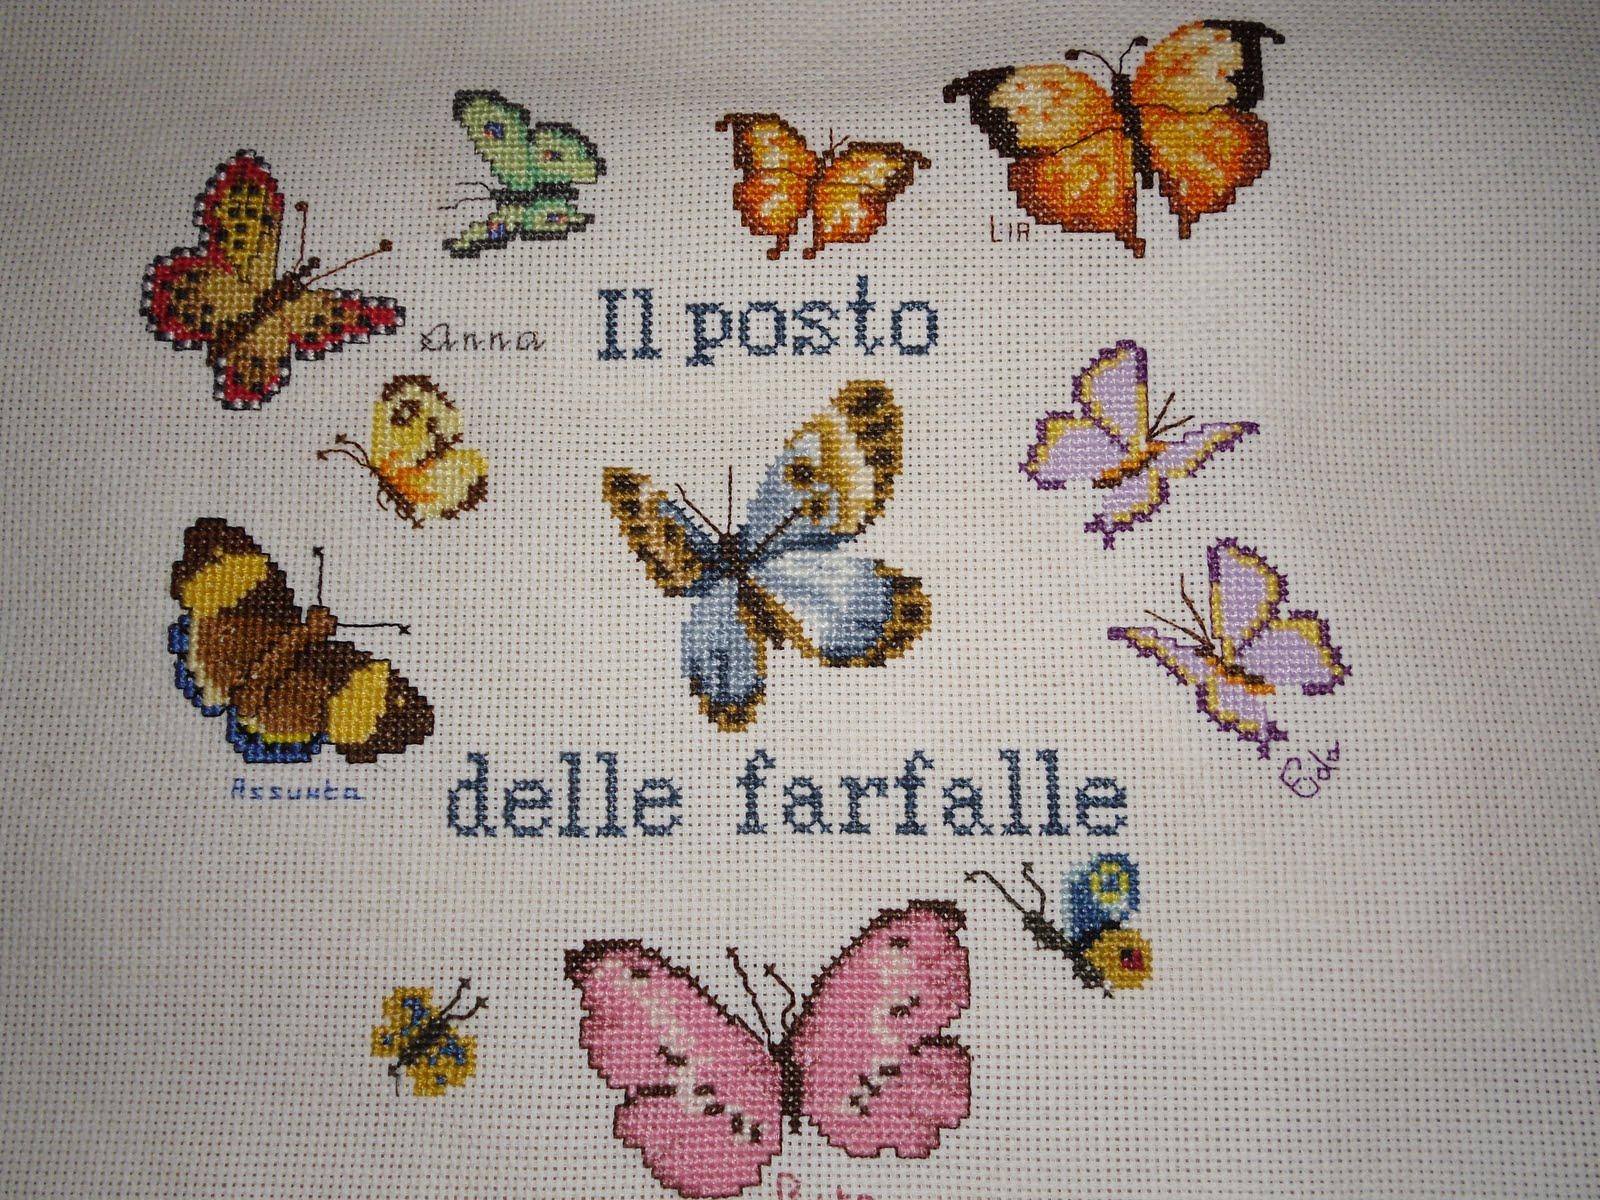 La comtesse le point de croix farfalle d 39 autunno for Punto croce farfalle